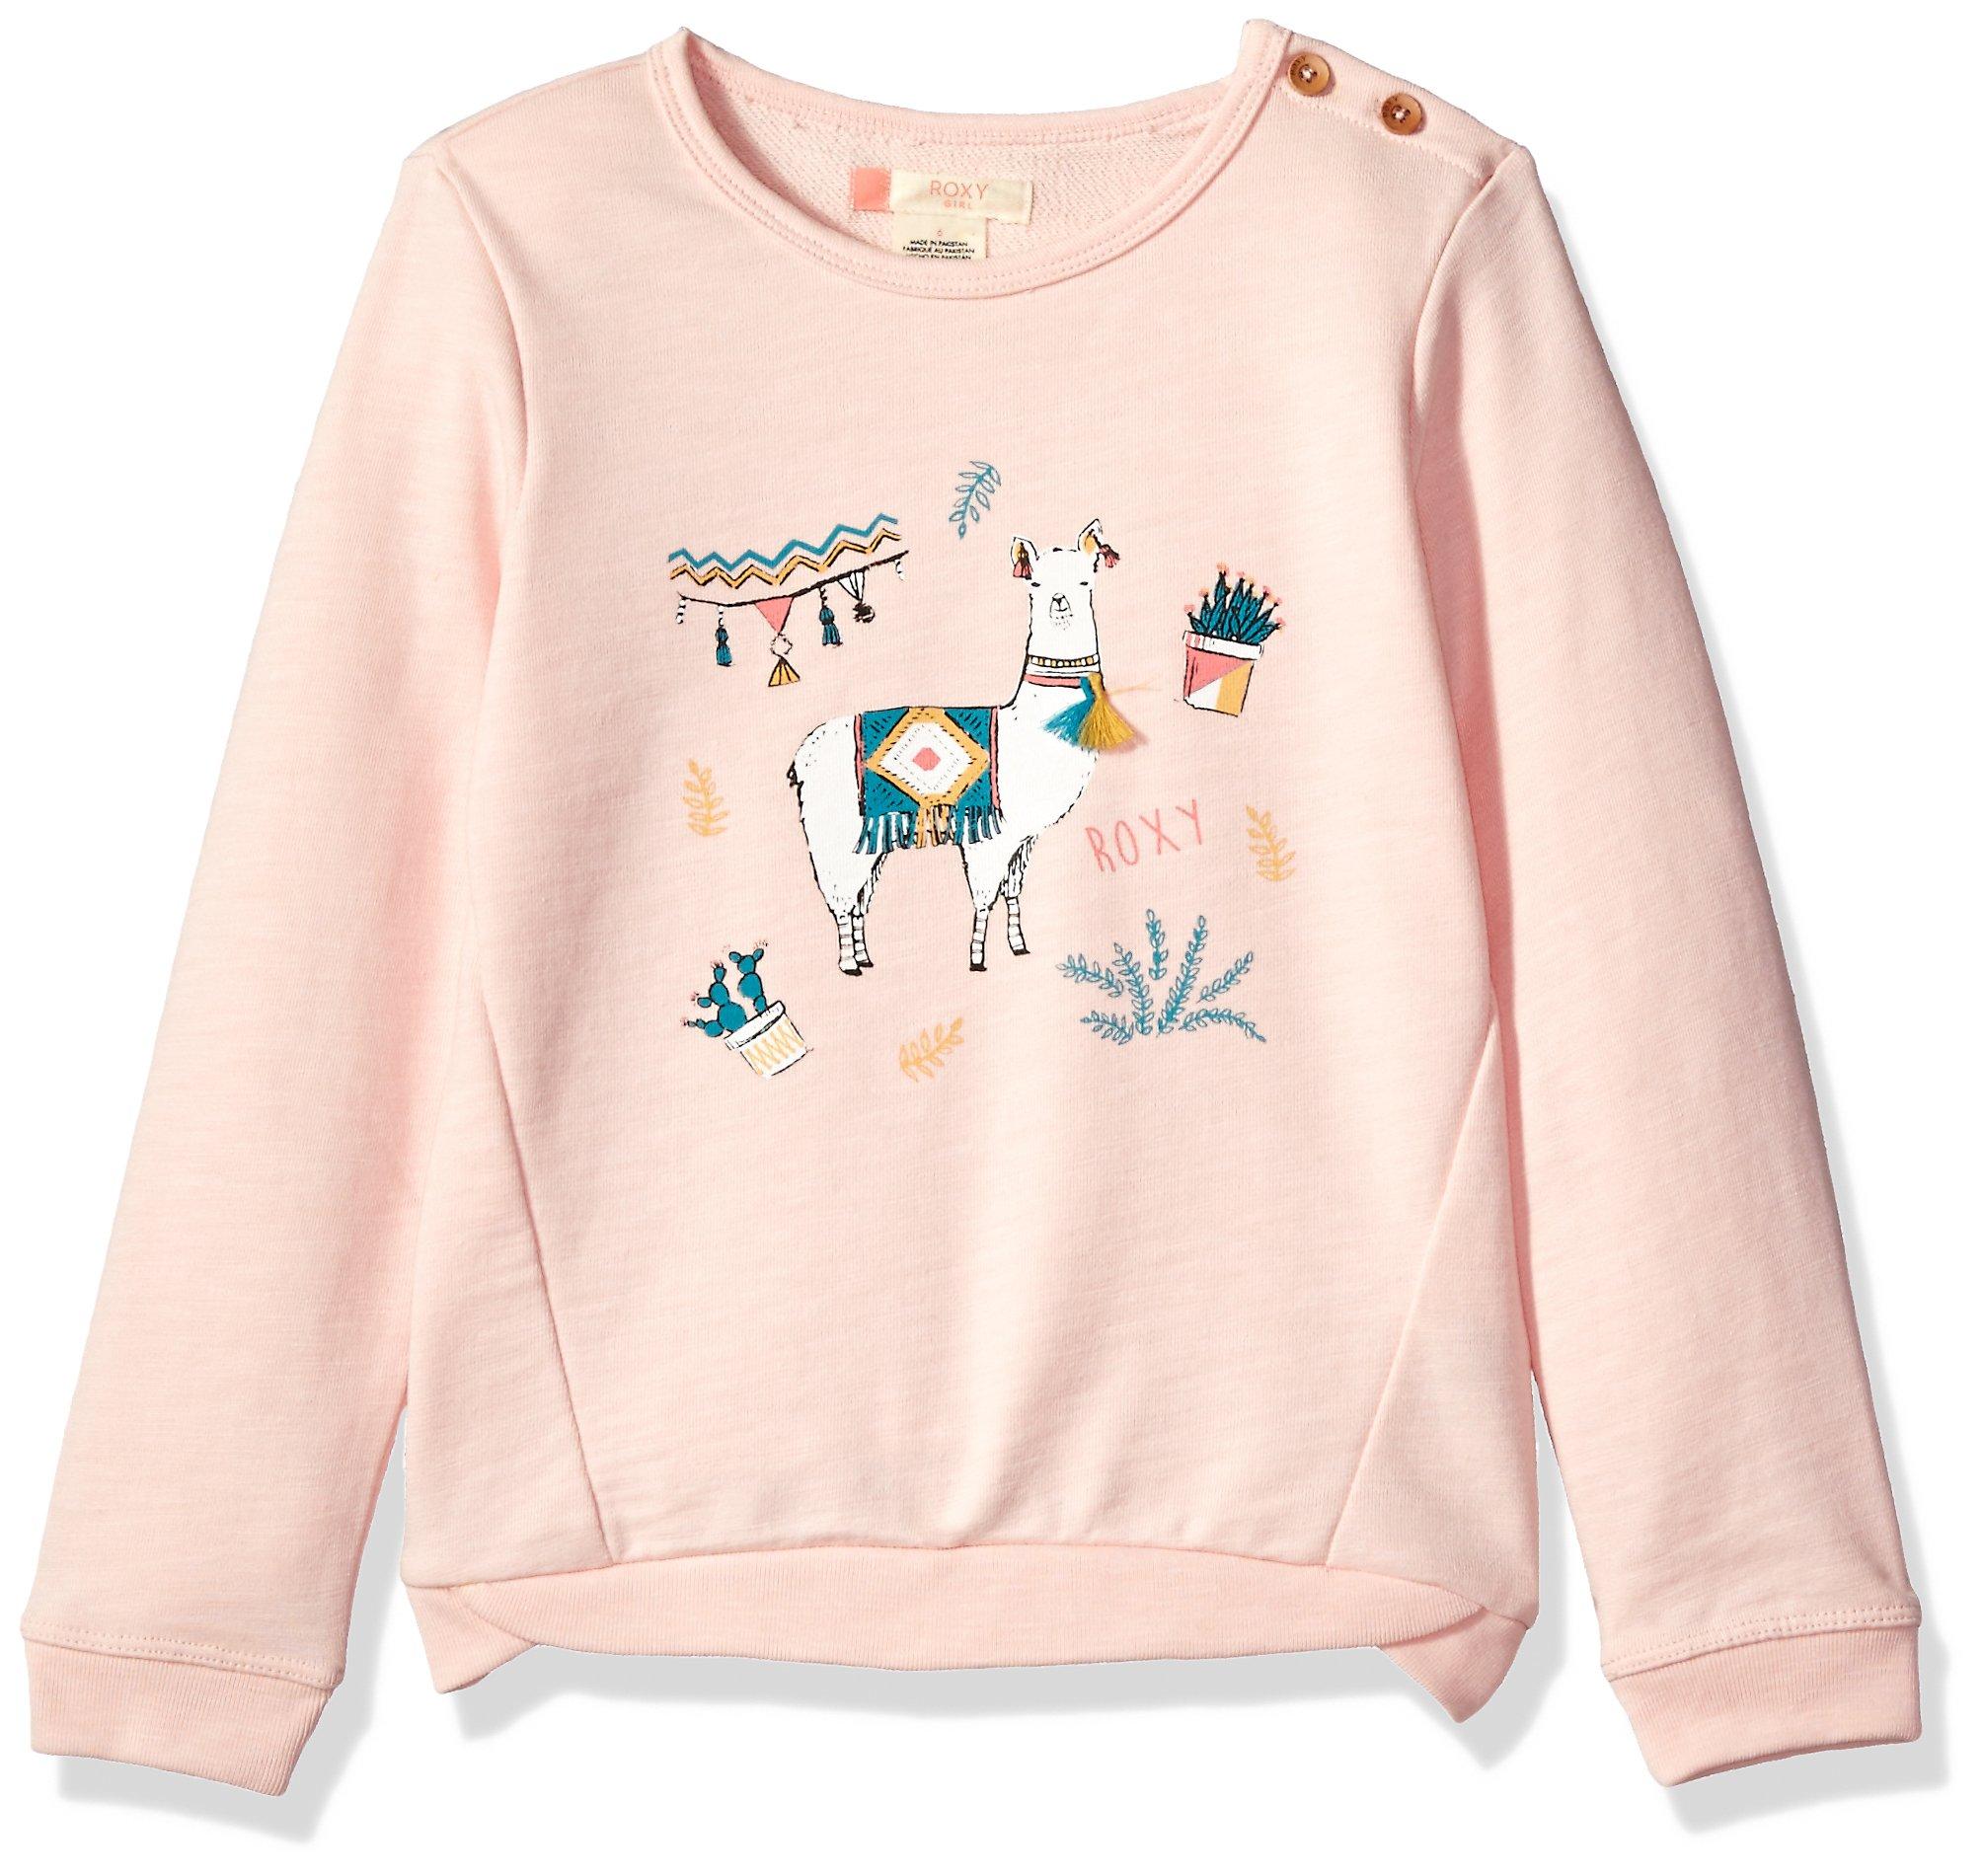 Roxy Little Girls' Palm's Valley Lami Lama Sweater, Rose Quartz, 2T